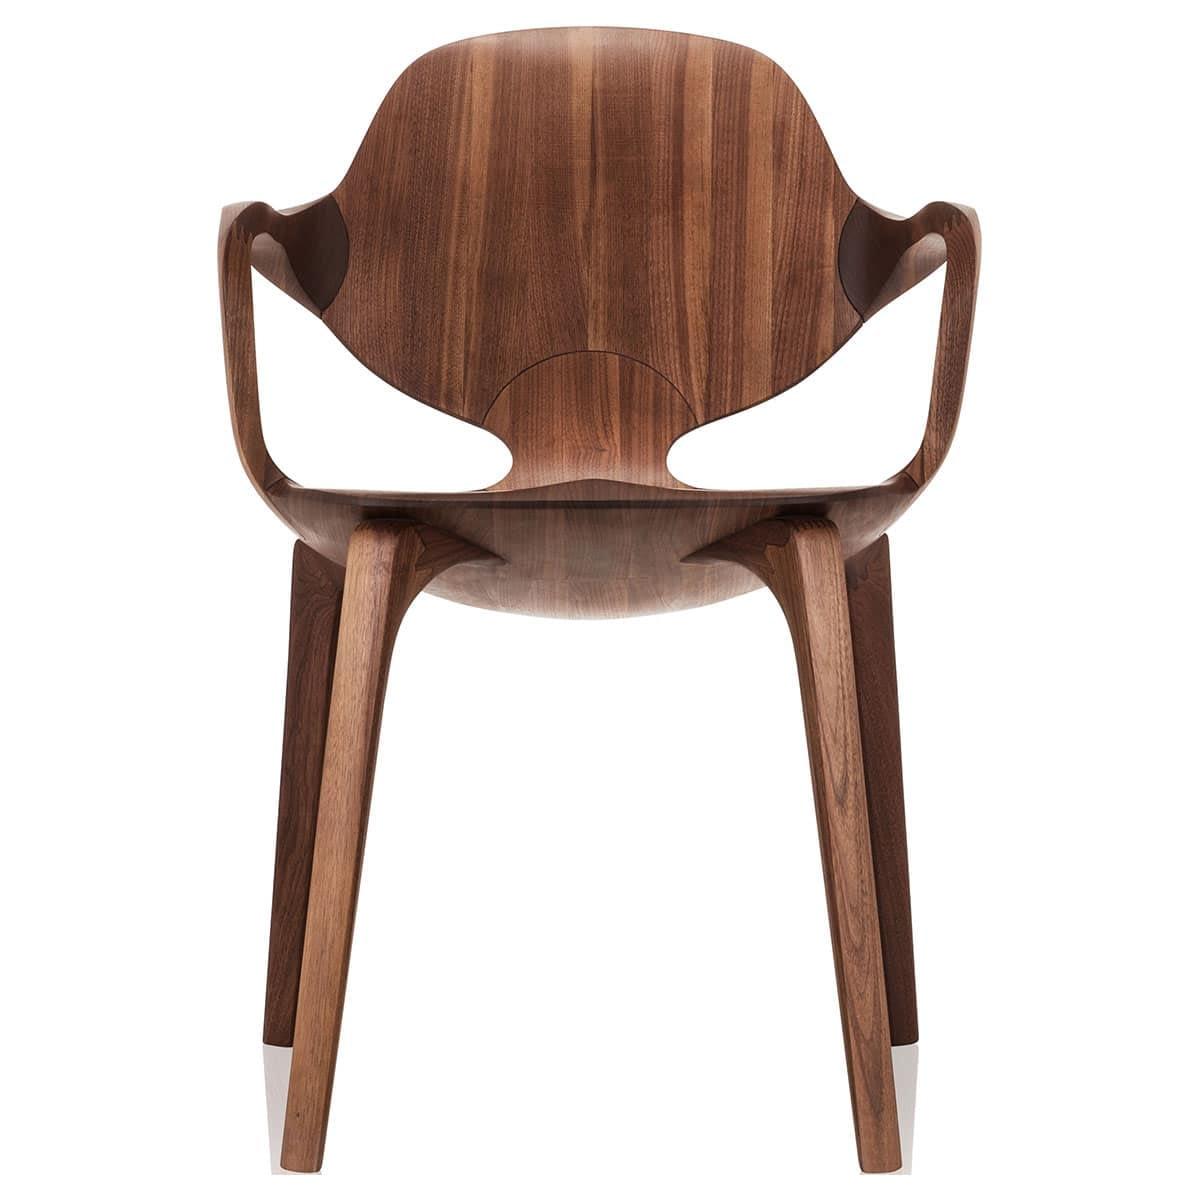 Designer Jader Almeidal Design Clad Chair